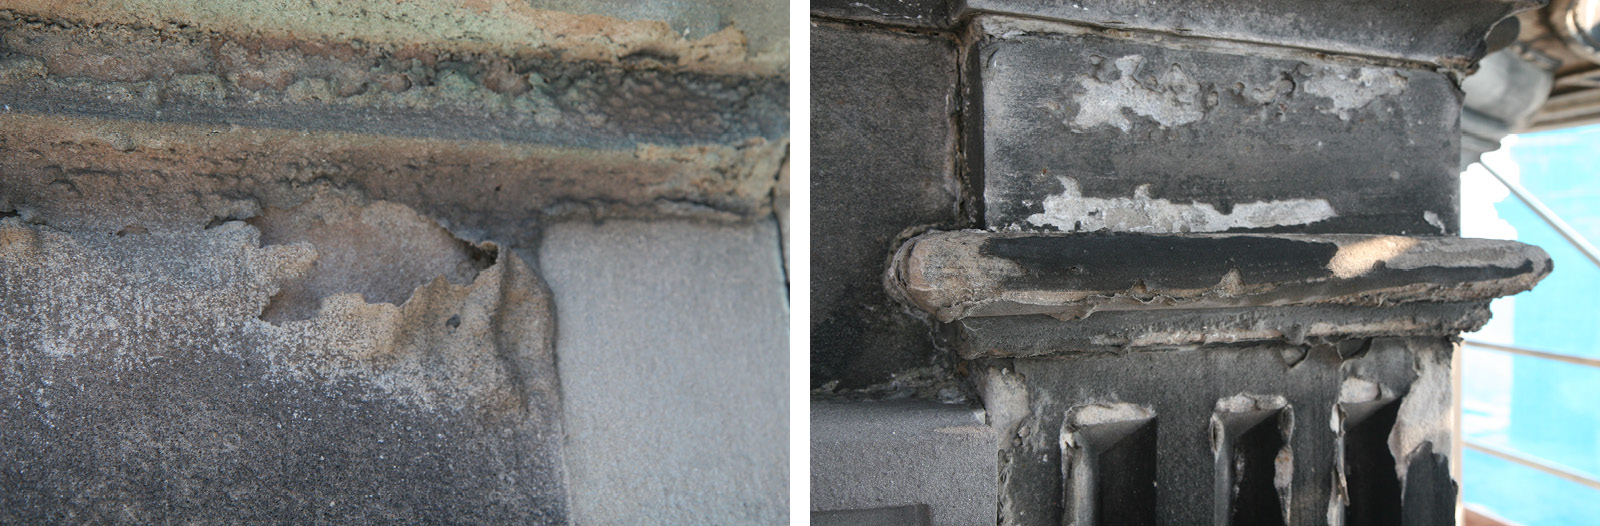 Abb. 3 u 4: Absandende (links) und abschalende (rechts) Oberflächen